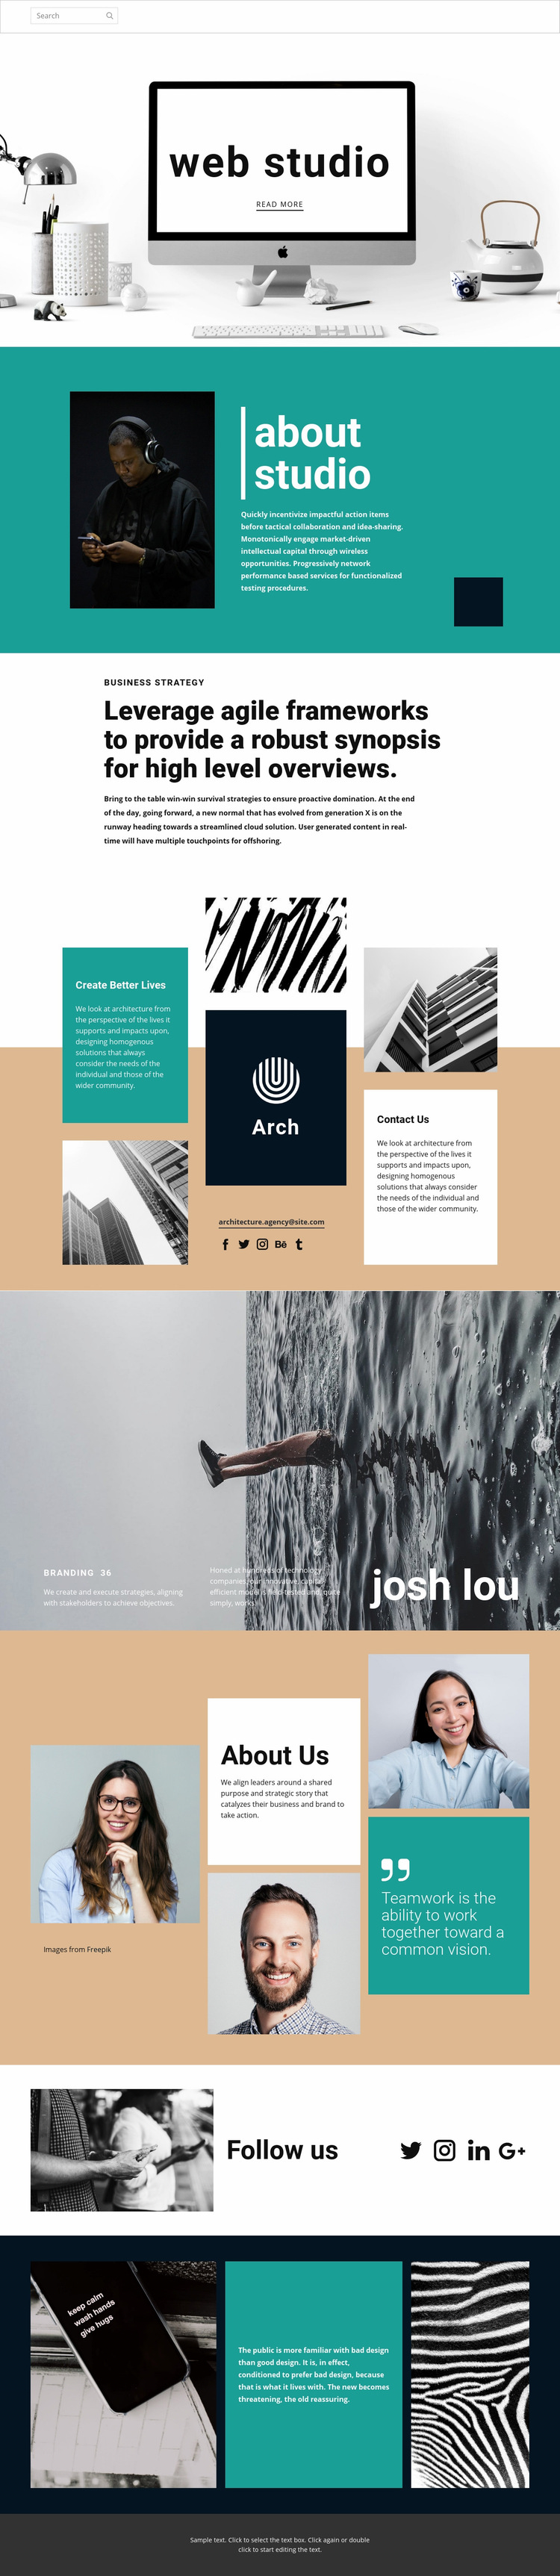 Web design studio of art Web Page Design